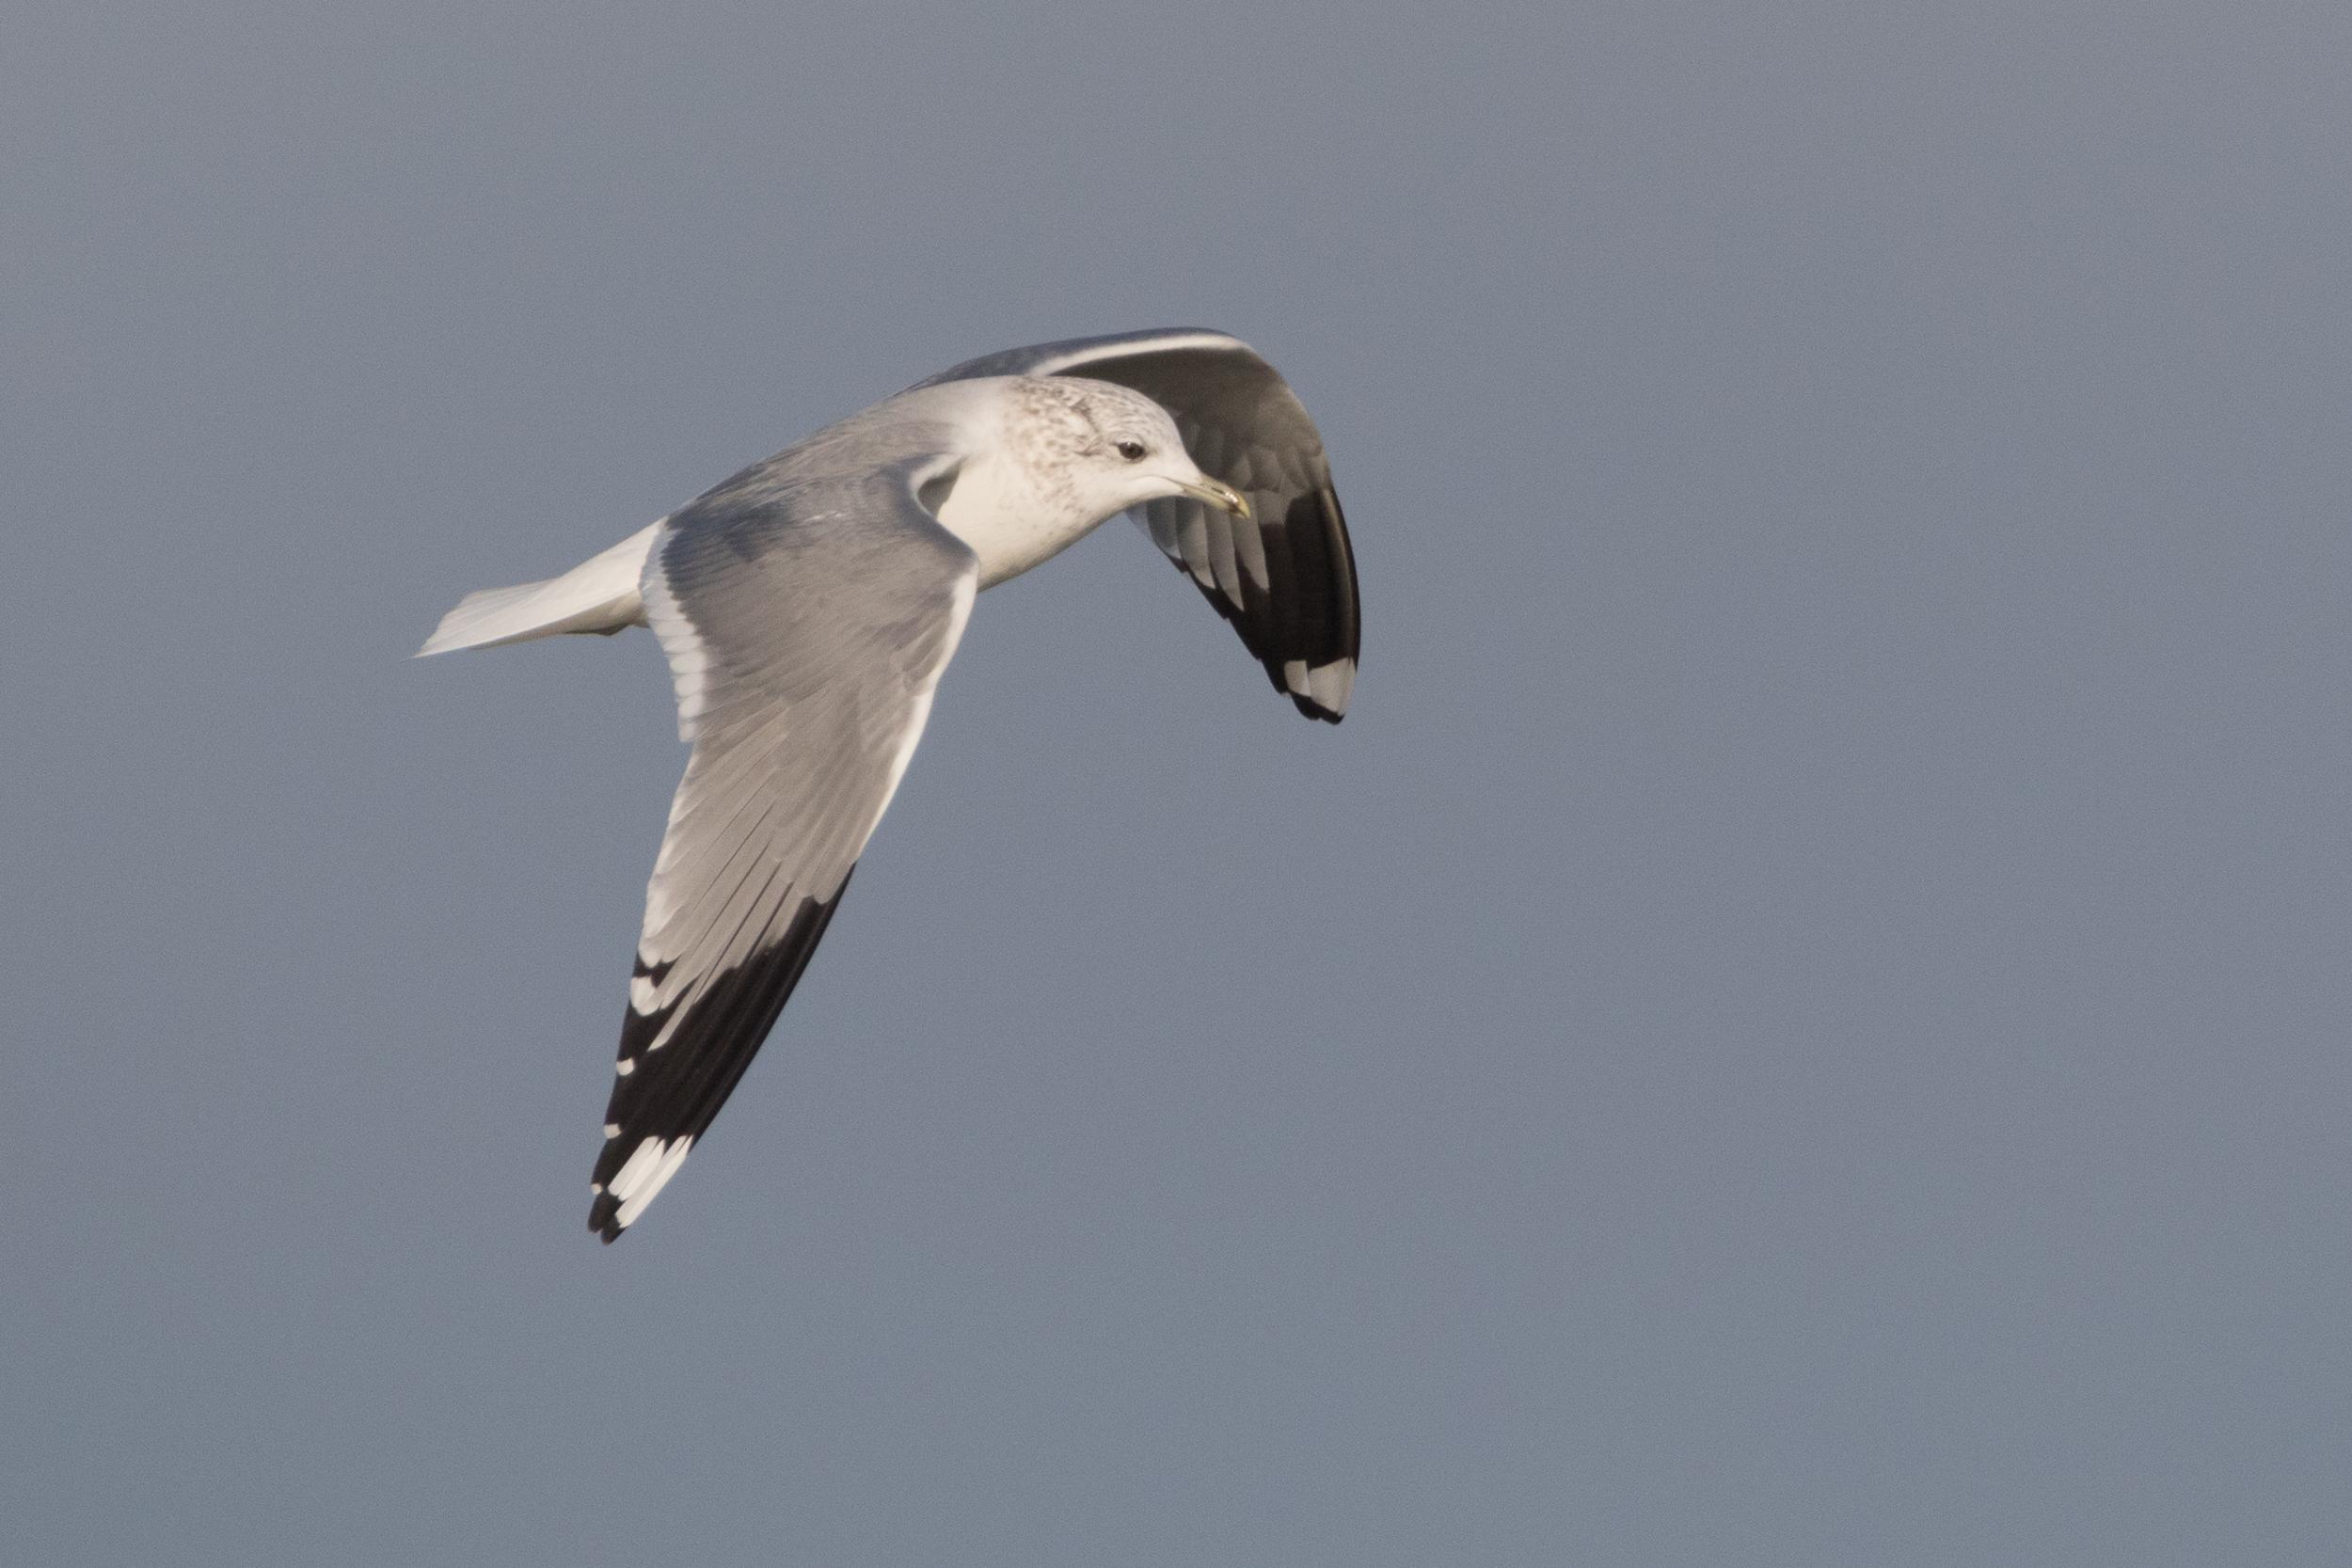 20170121-Common Gull Adult-84.jpg